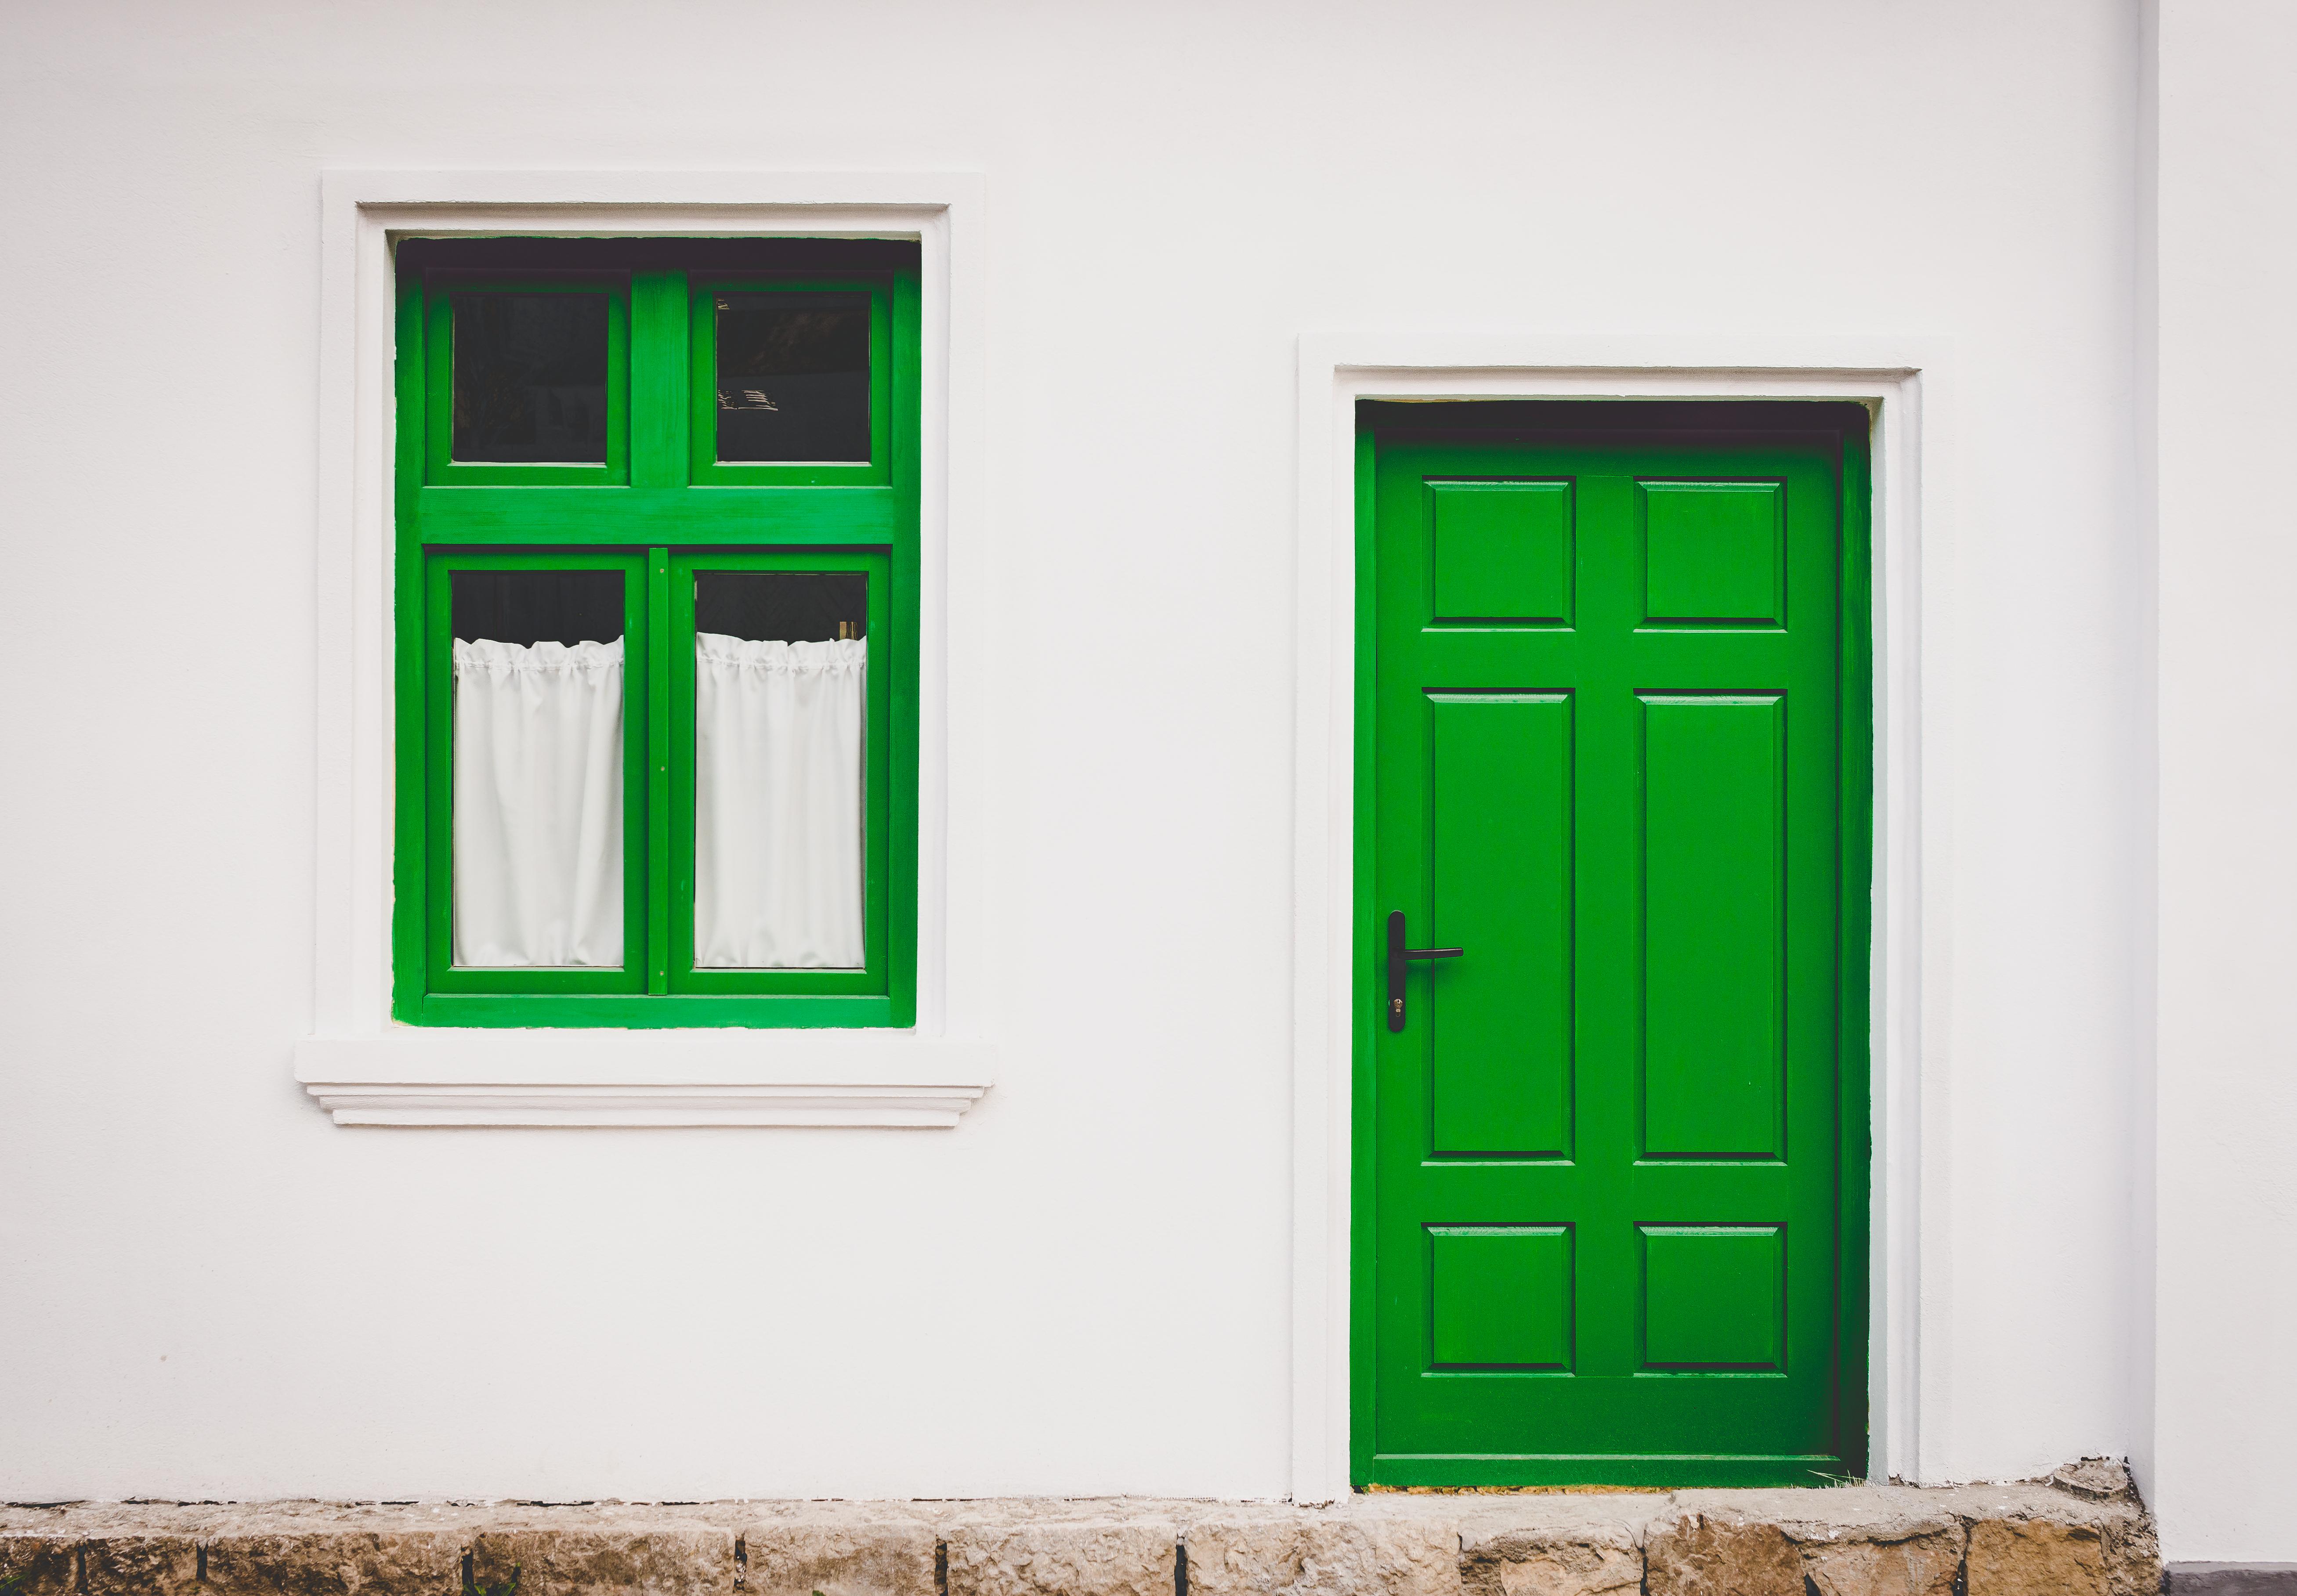 house window wall green entrance door closed & Free Images : house window wall green entrance door closed ...